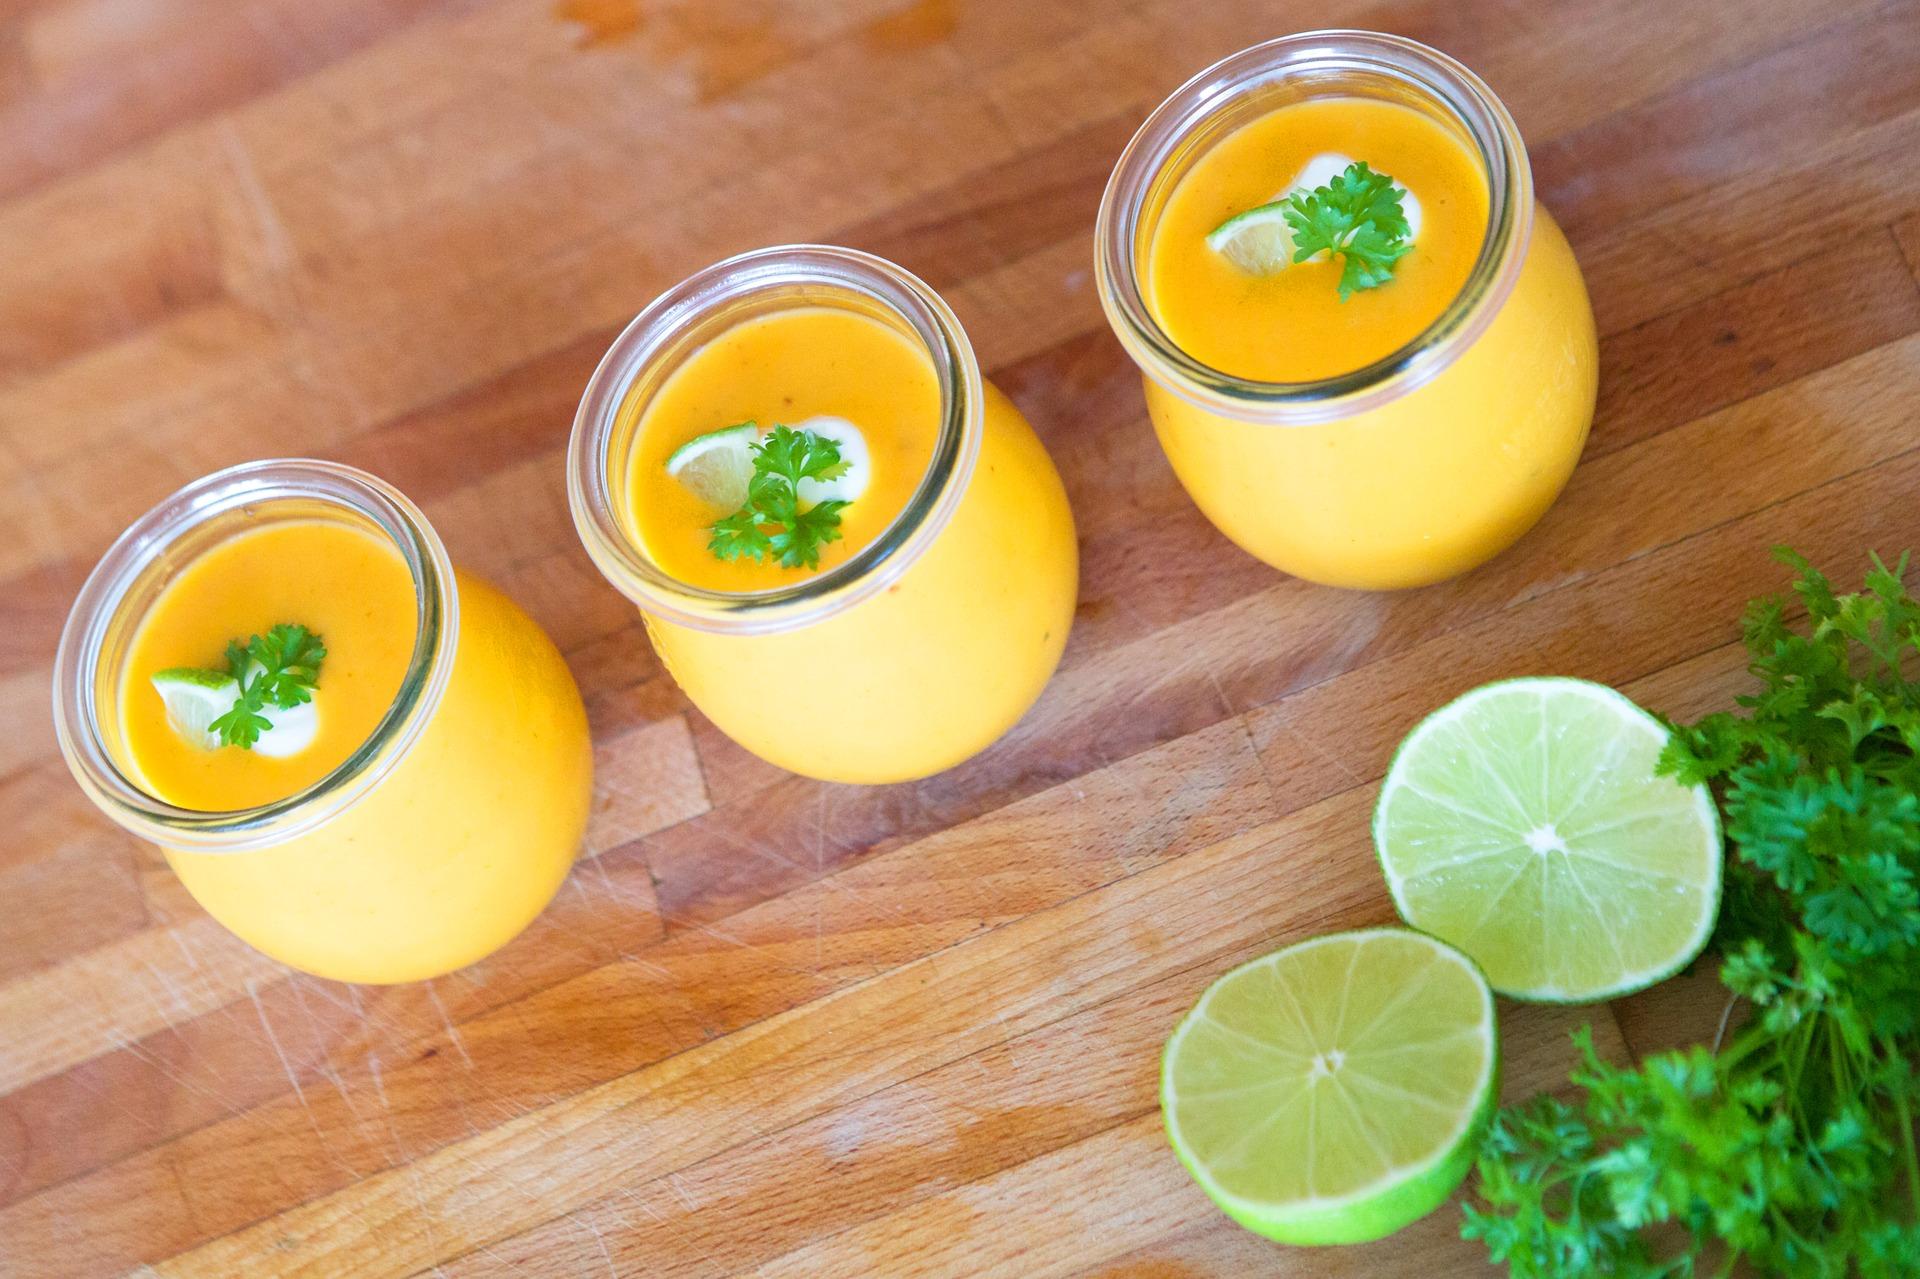 Süßkartoffel-Kokos-Suppe mit Limette